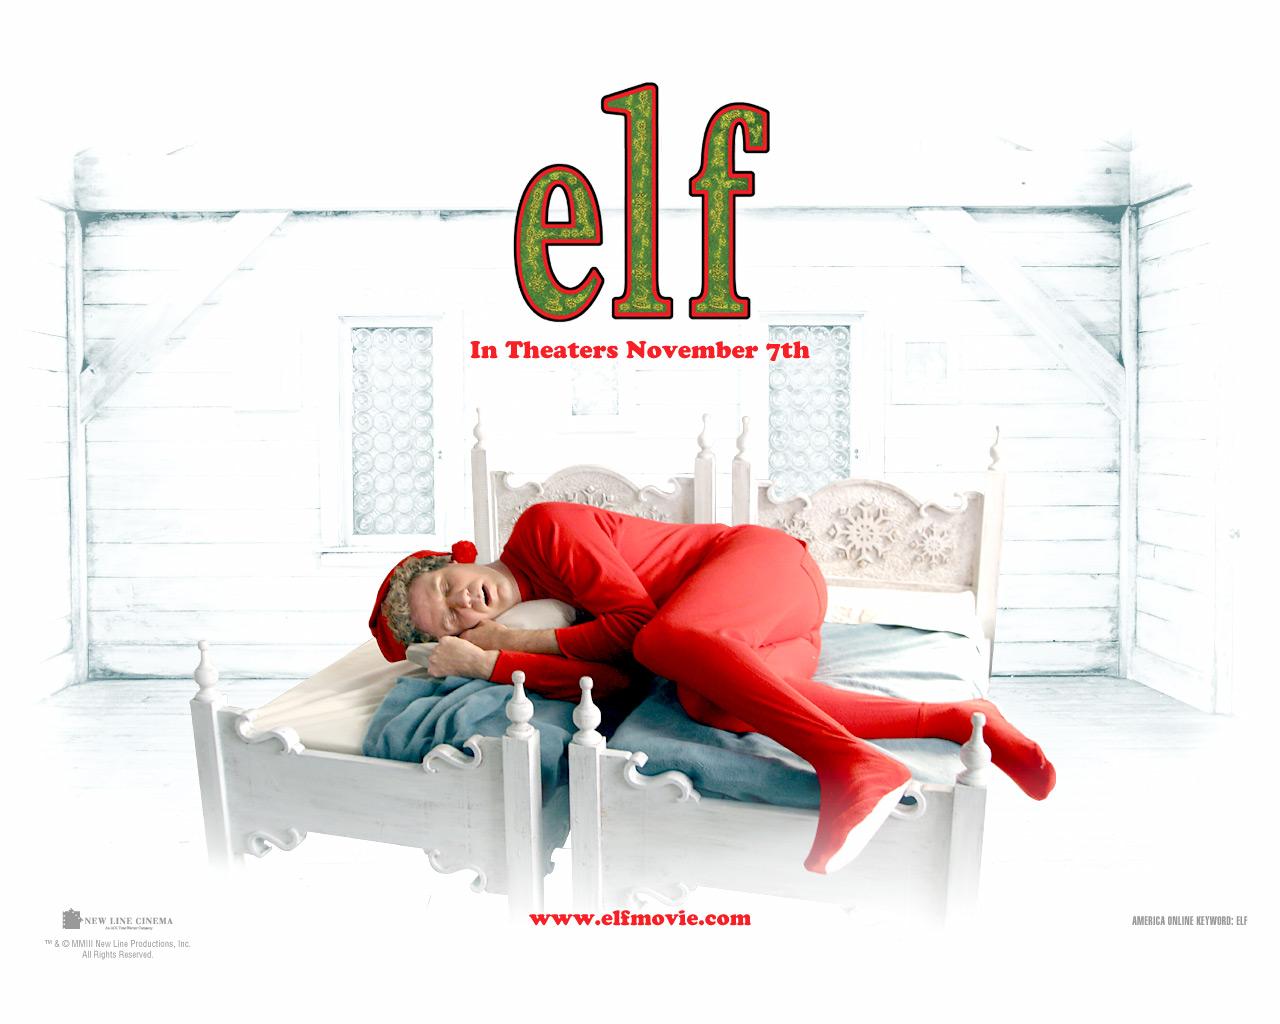 Elfen clipart elf movie Movie Wallpapers Elf Elf WallpaperSafari